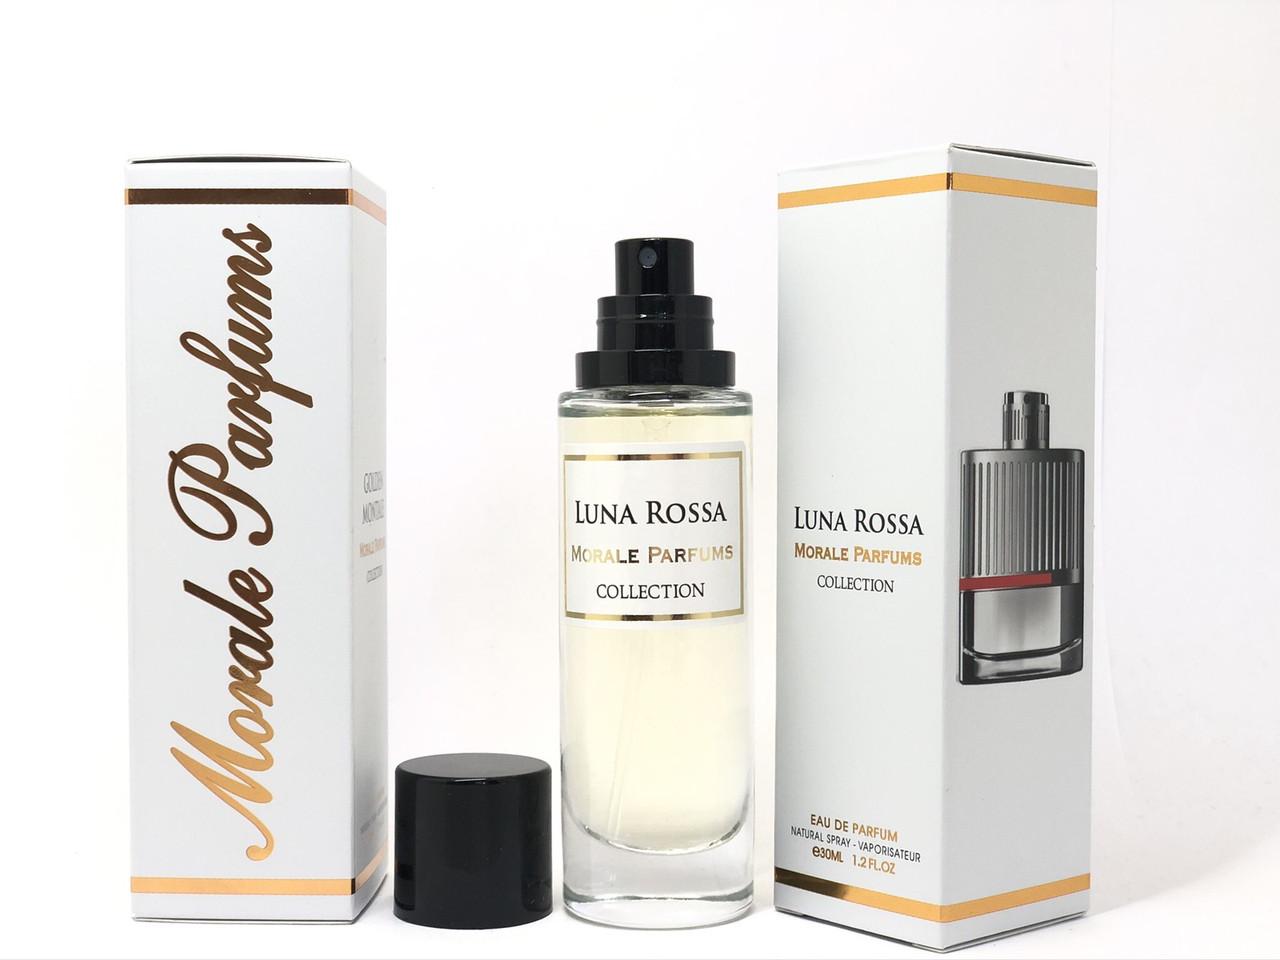 Мужской аромат Luna Rossa Morale Parfums (Луна Росса Морал парфюм) 30 мл